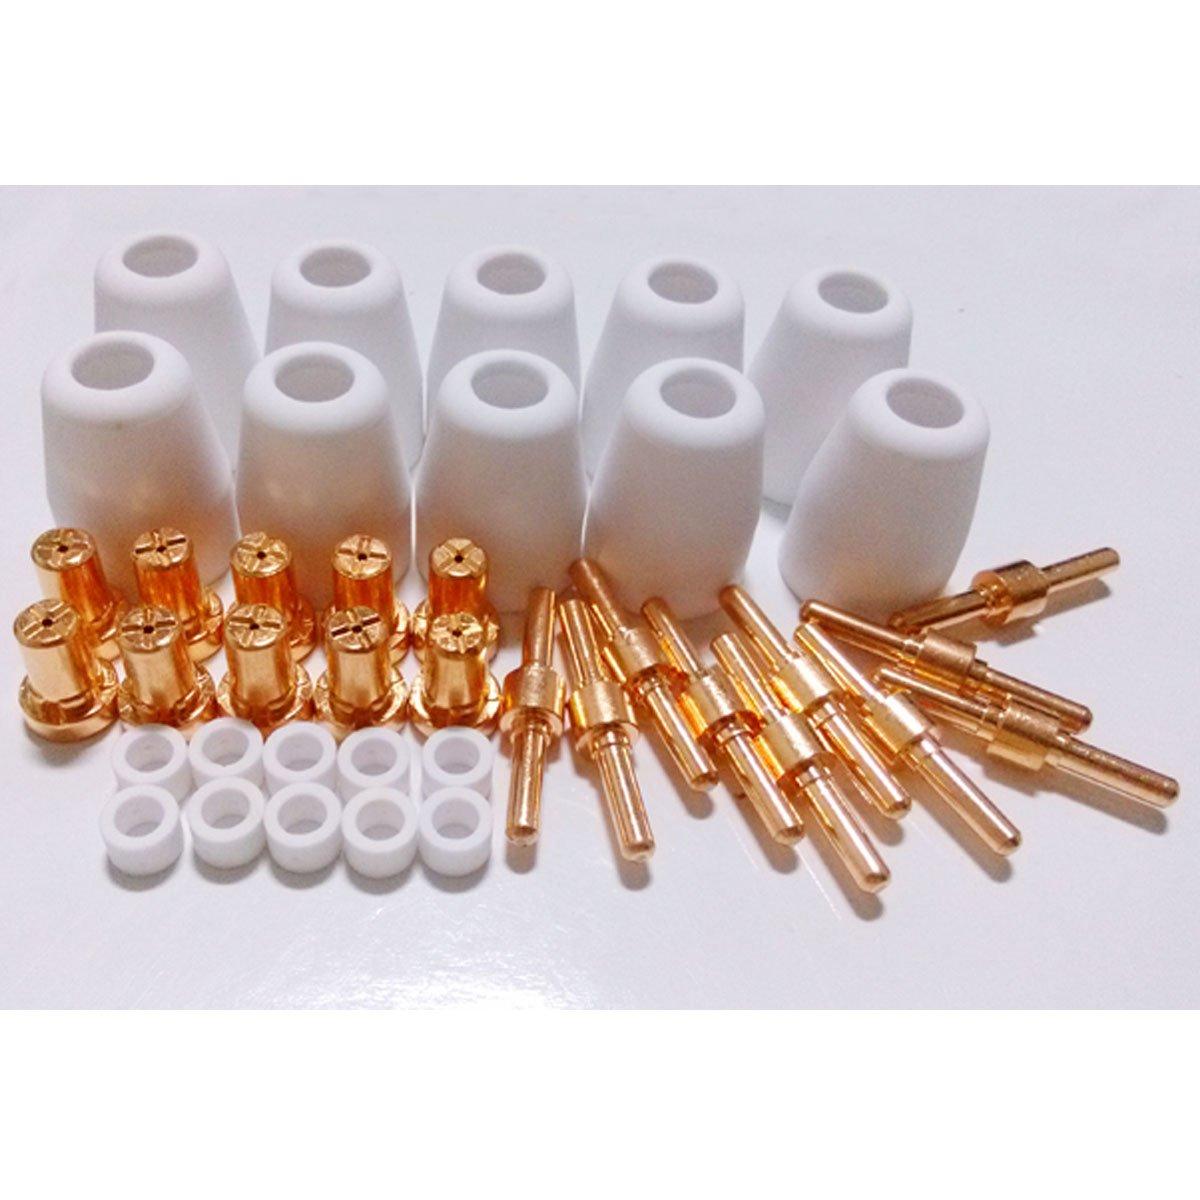 B.W.P PT-31 LGK40 Extended Electrodes and Nozzles Consumables Kit For Stahlwerk Plasma Cutter 40D CUT40 50D CUT50 Super 200P